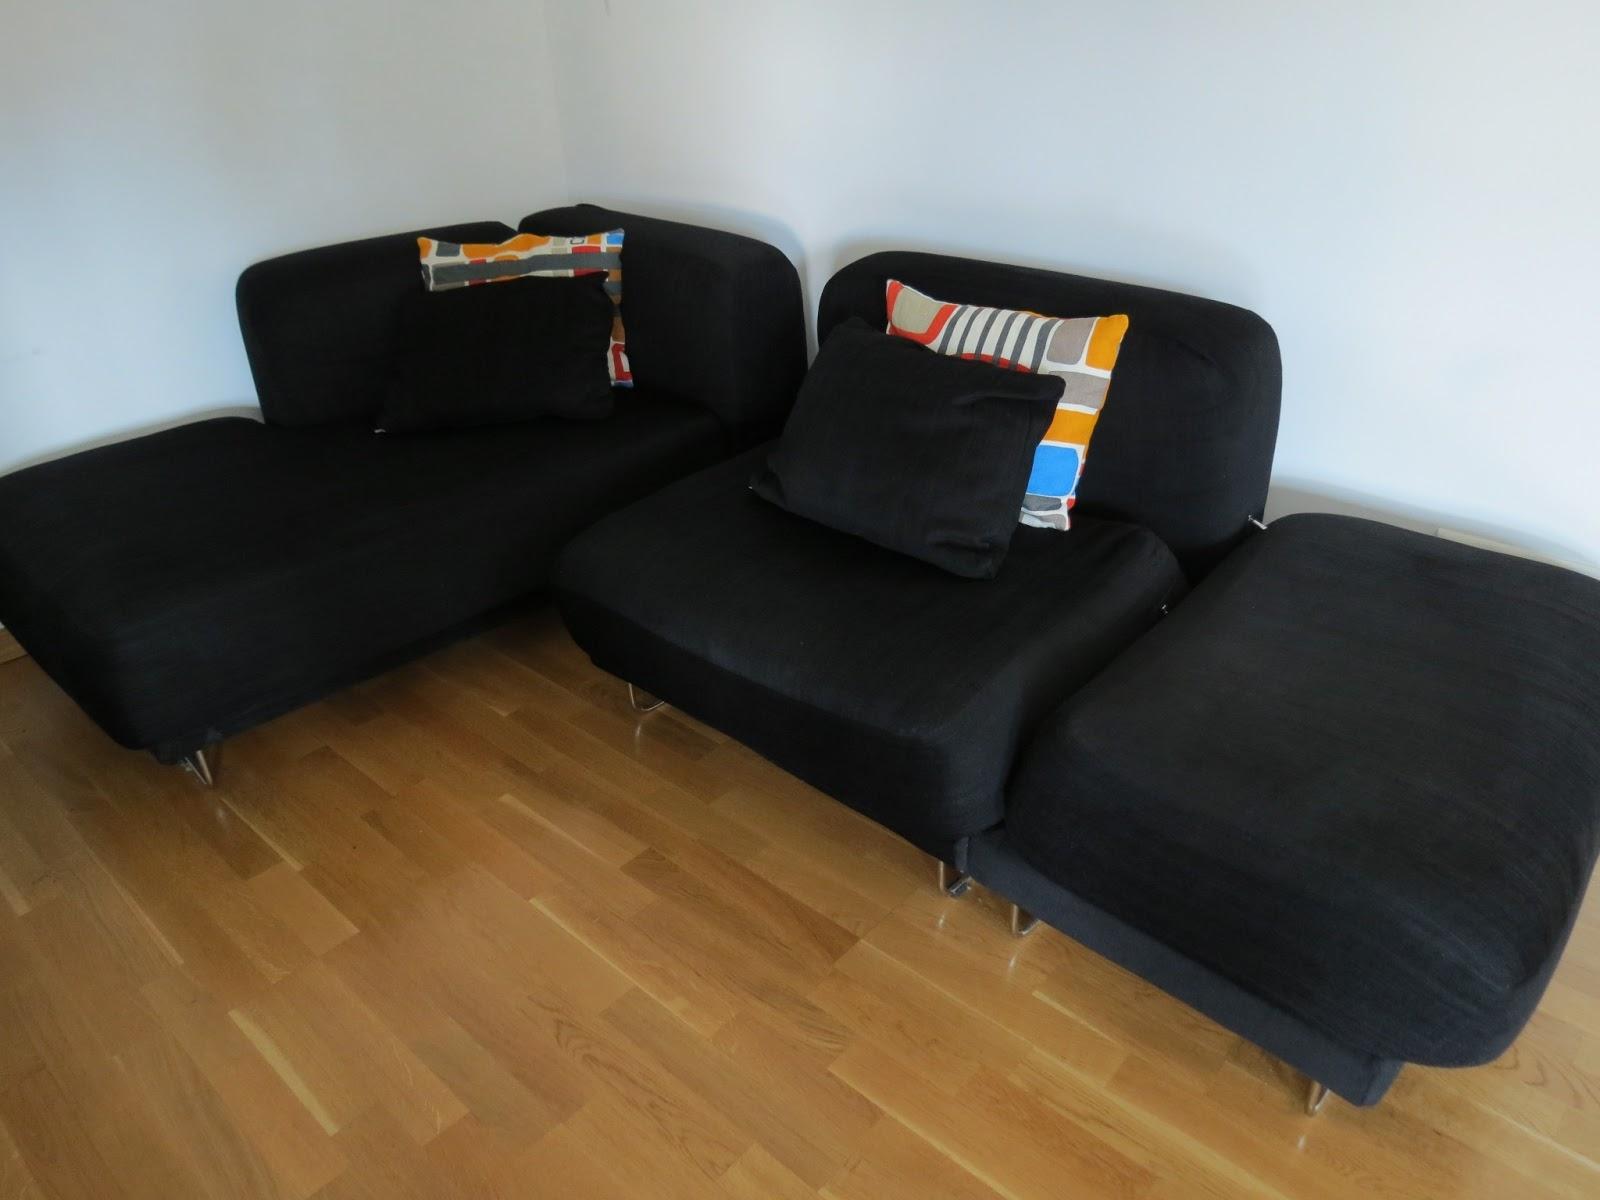 ikea tylosand sofa black friday leather uk vendemos nuestras cosas sofá 3 piezas